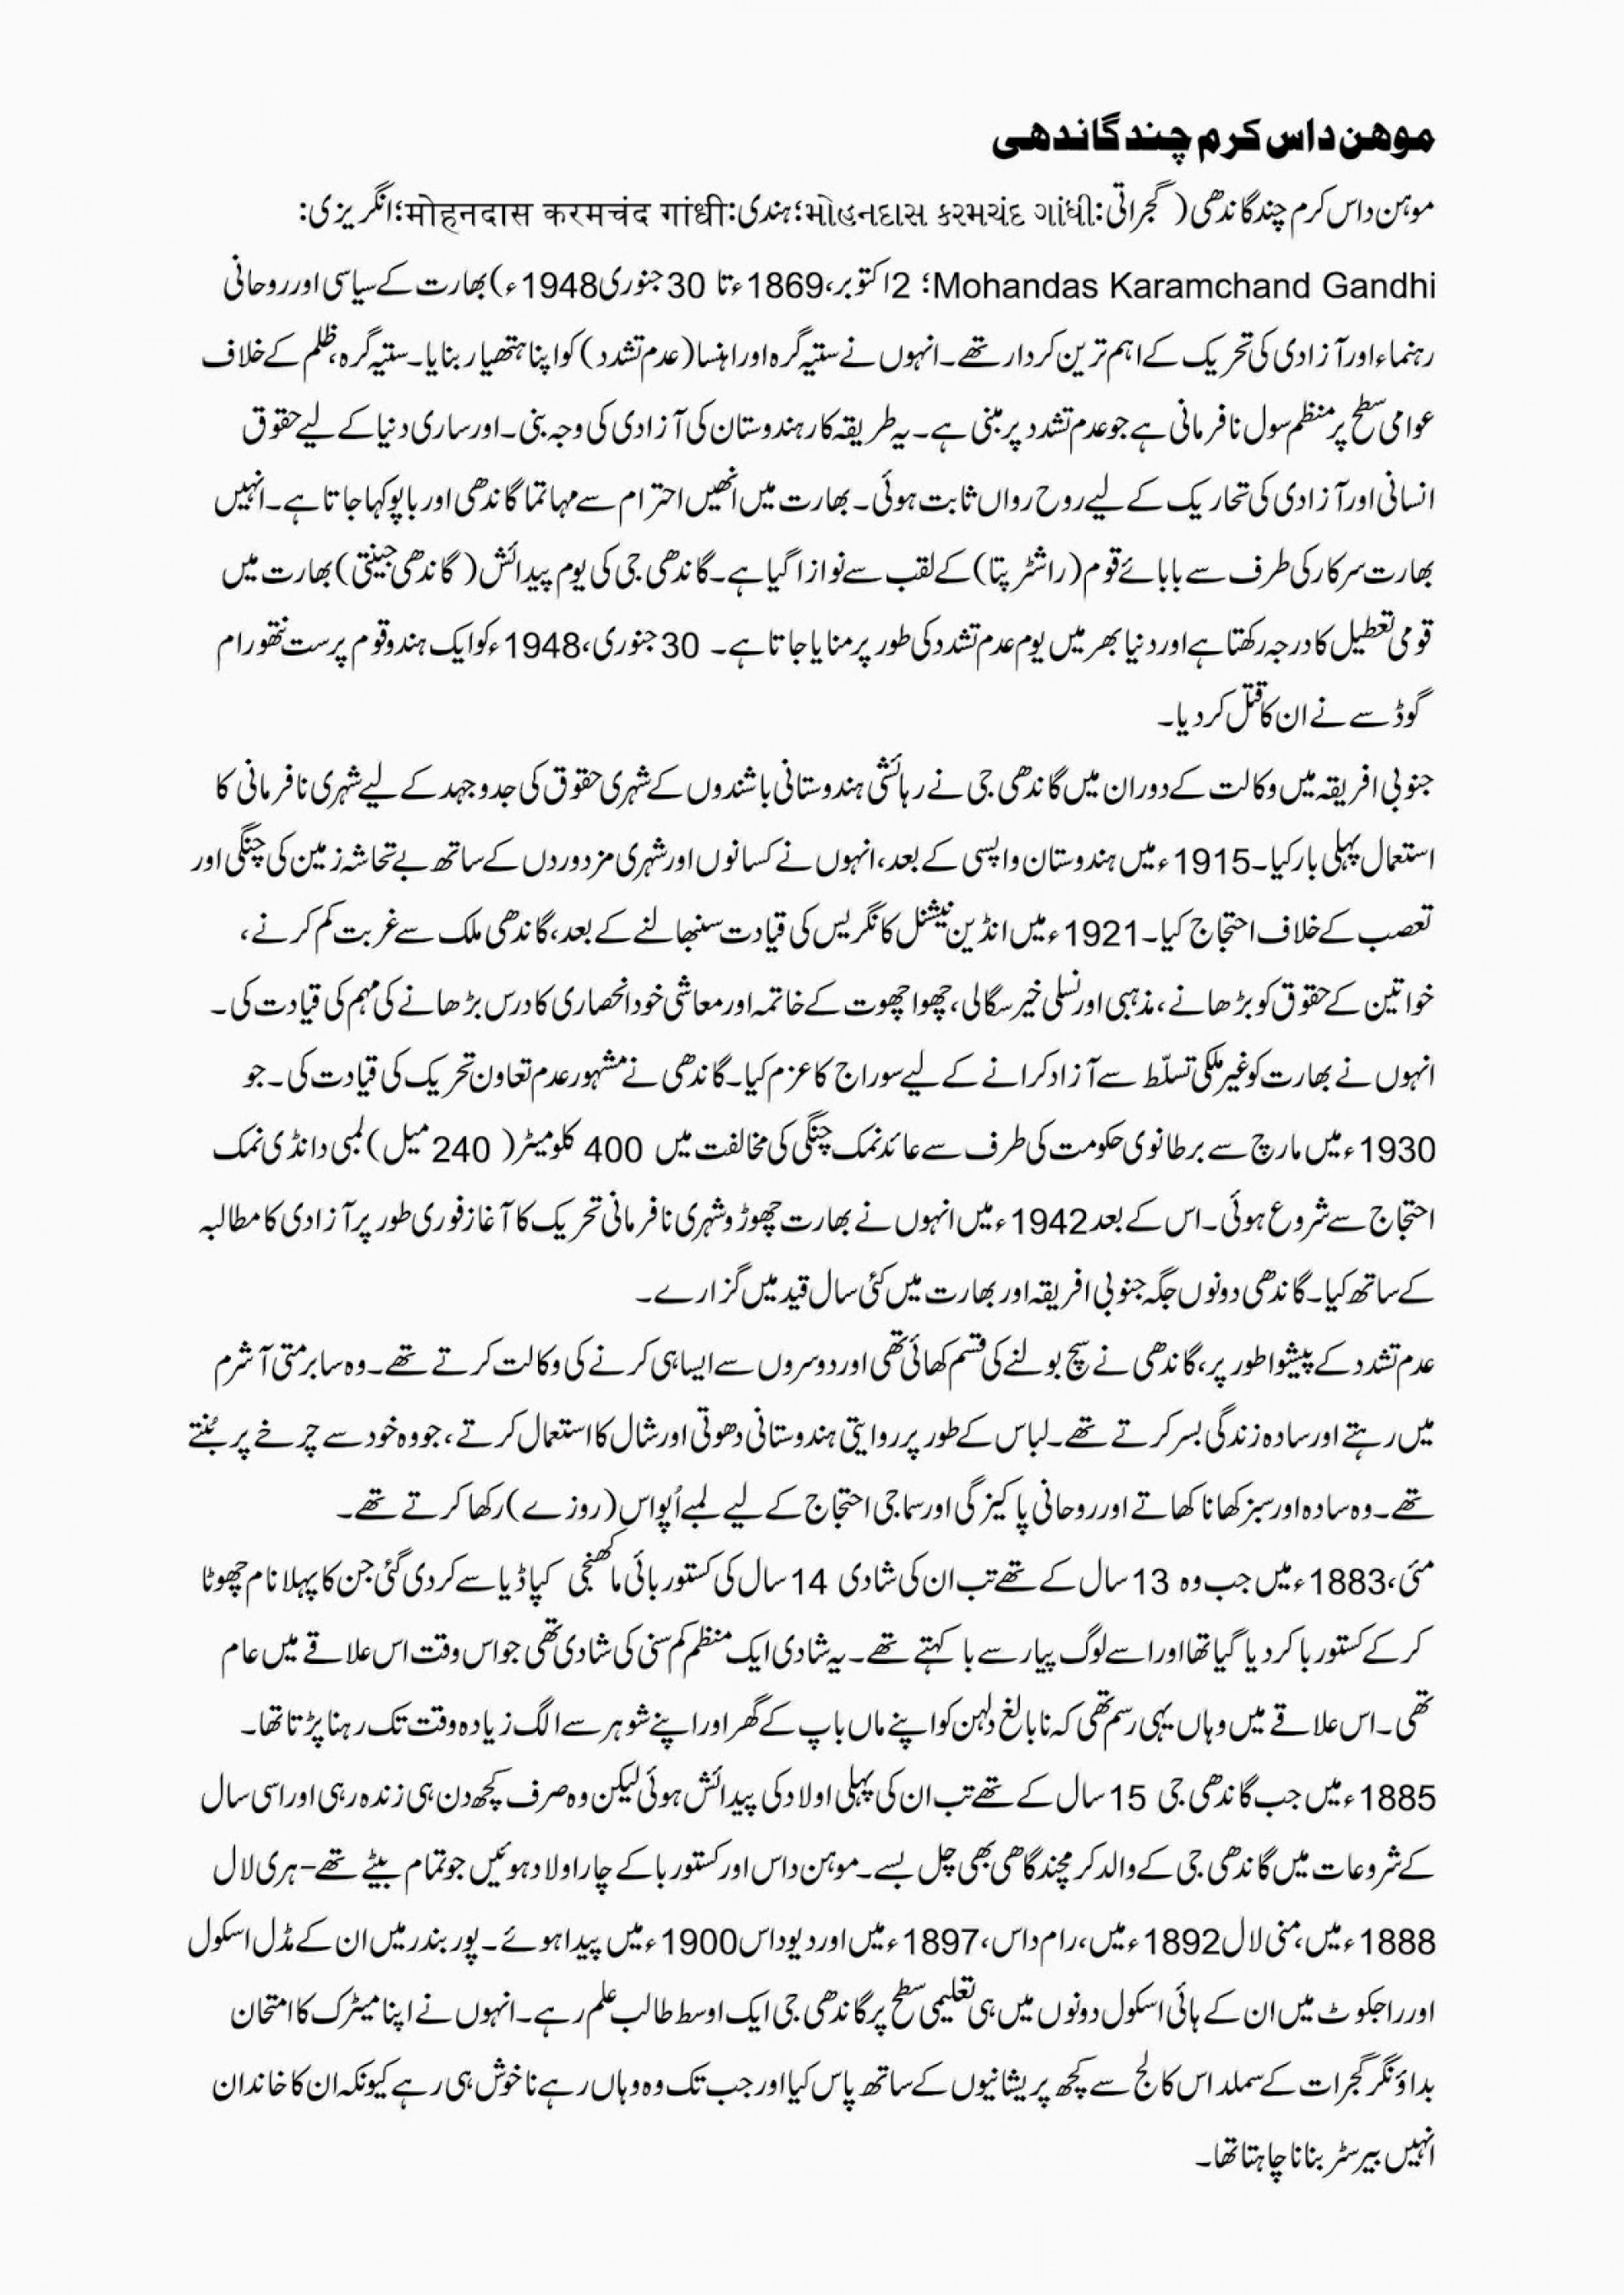 004 Essay Example Essay2bmahatma2bgandhi2burdu2b1 Mahatma Magnificent Gandhi Conclusion In English 1000 Words Pdf Hindi 5 Lines 1920